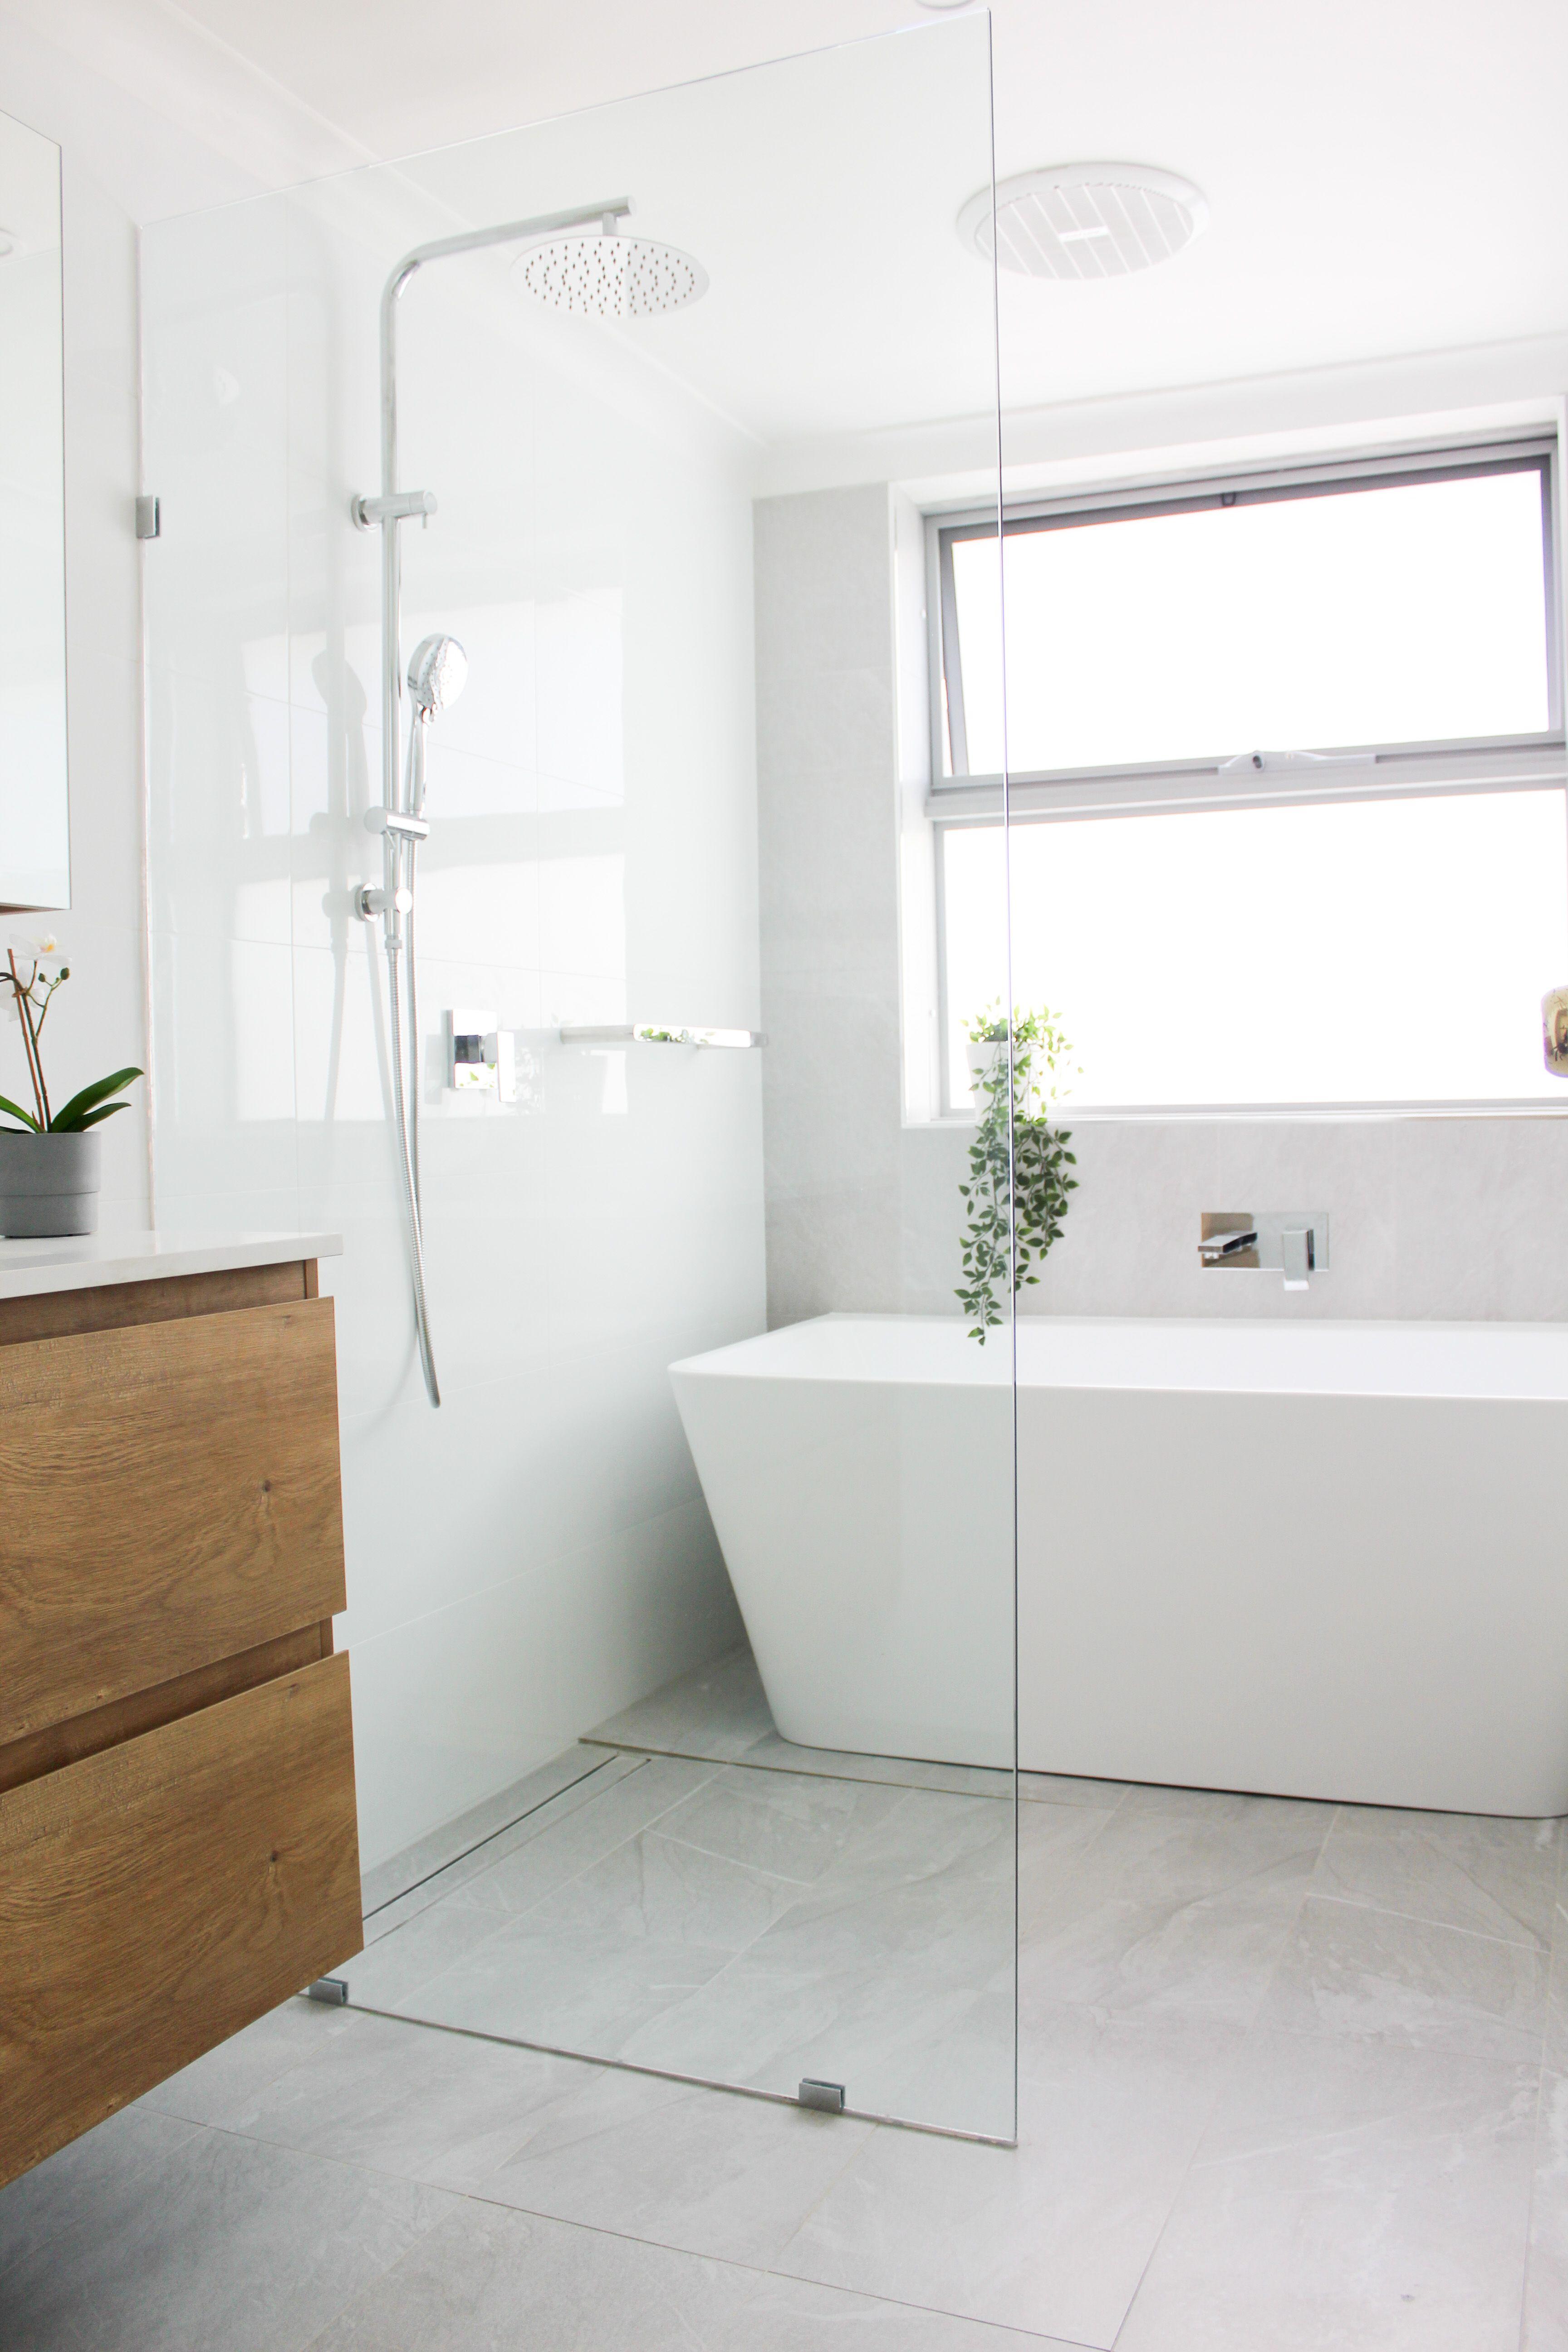 Freestanding Bath In 2020 Free Standing Bath Tub Freestanding Bathtub Shower Combo Free Standing Bath